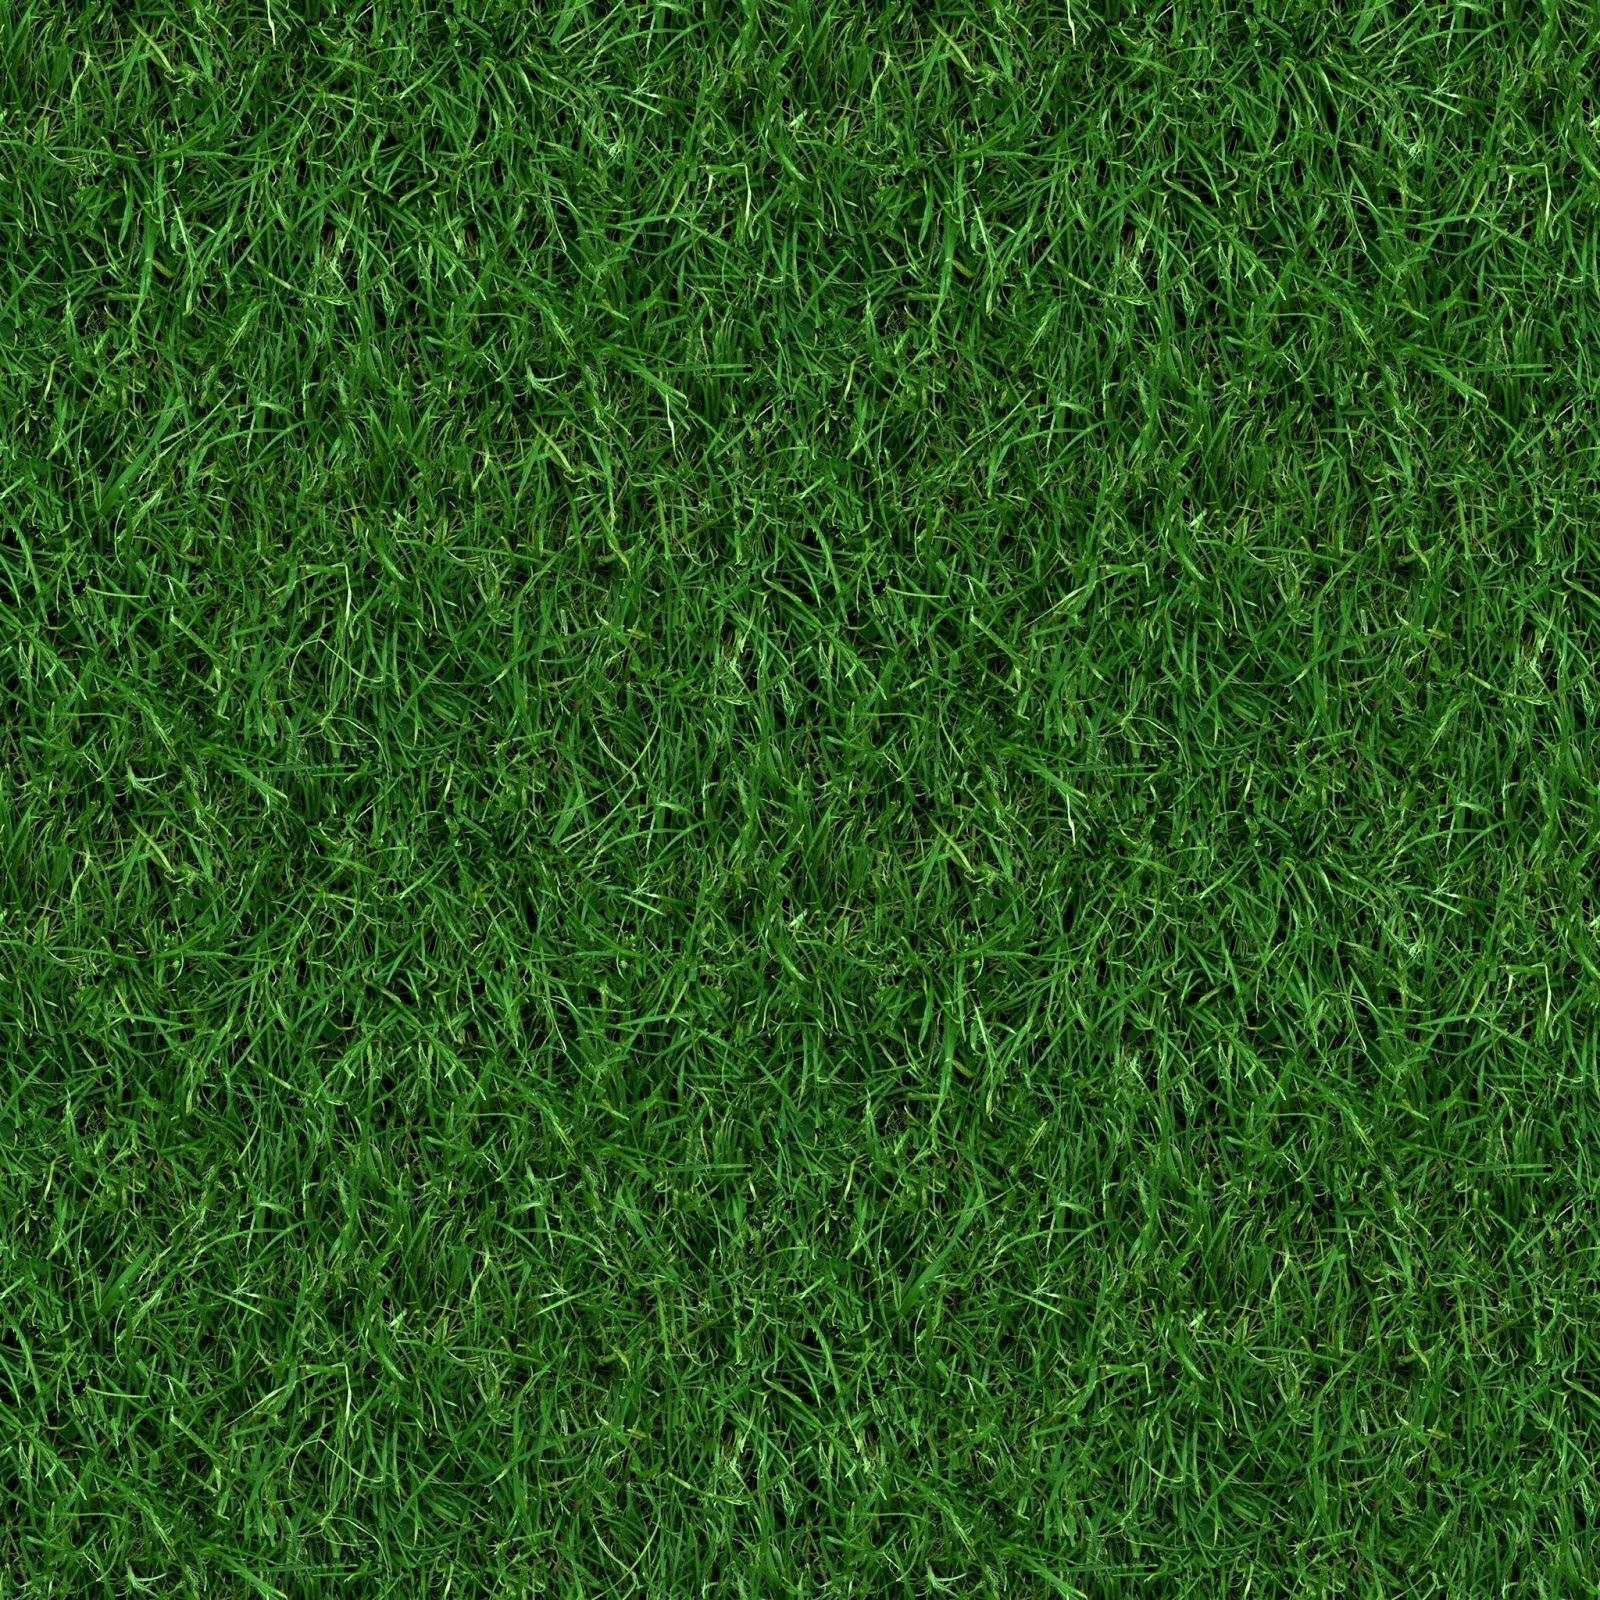 artificial turf texture. (GRASS 4) Seamless Turf Lawn Green Ground Field Texture Artificial S